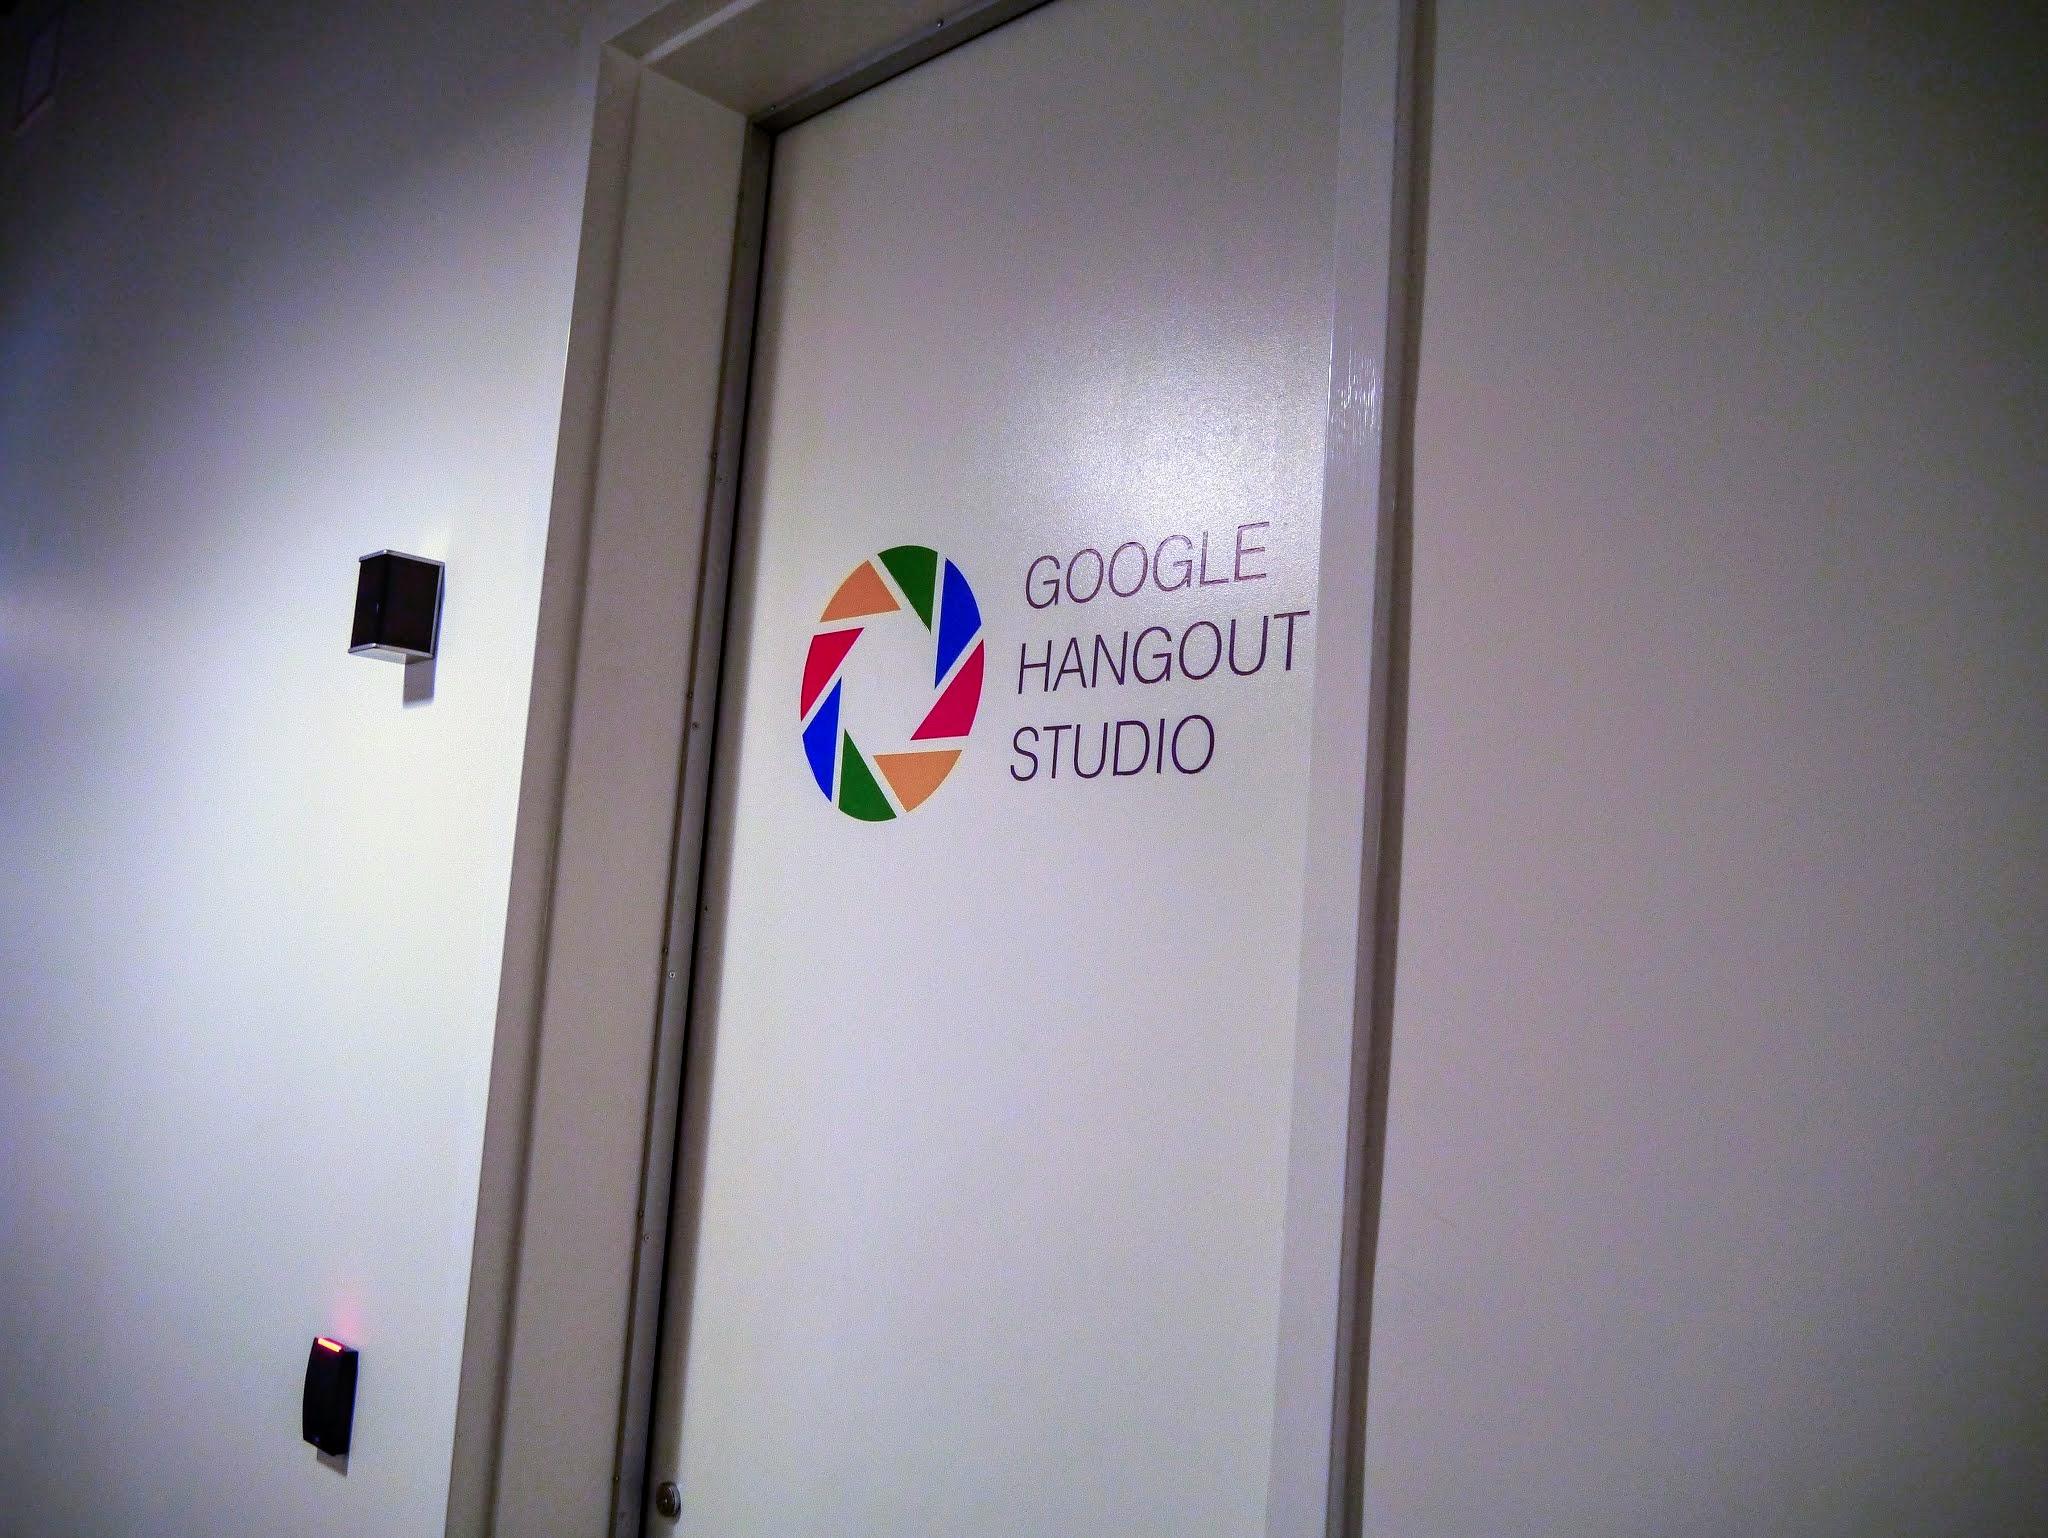 Google Hangout Studio